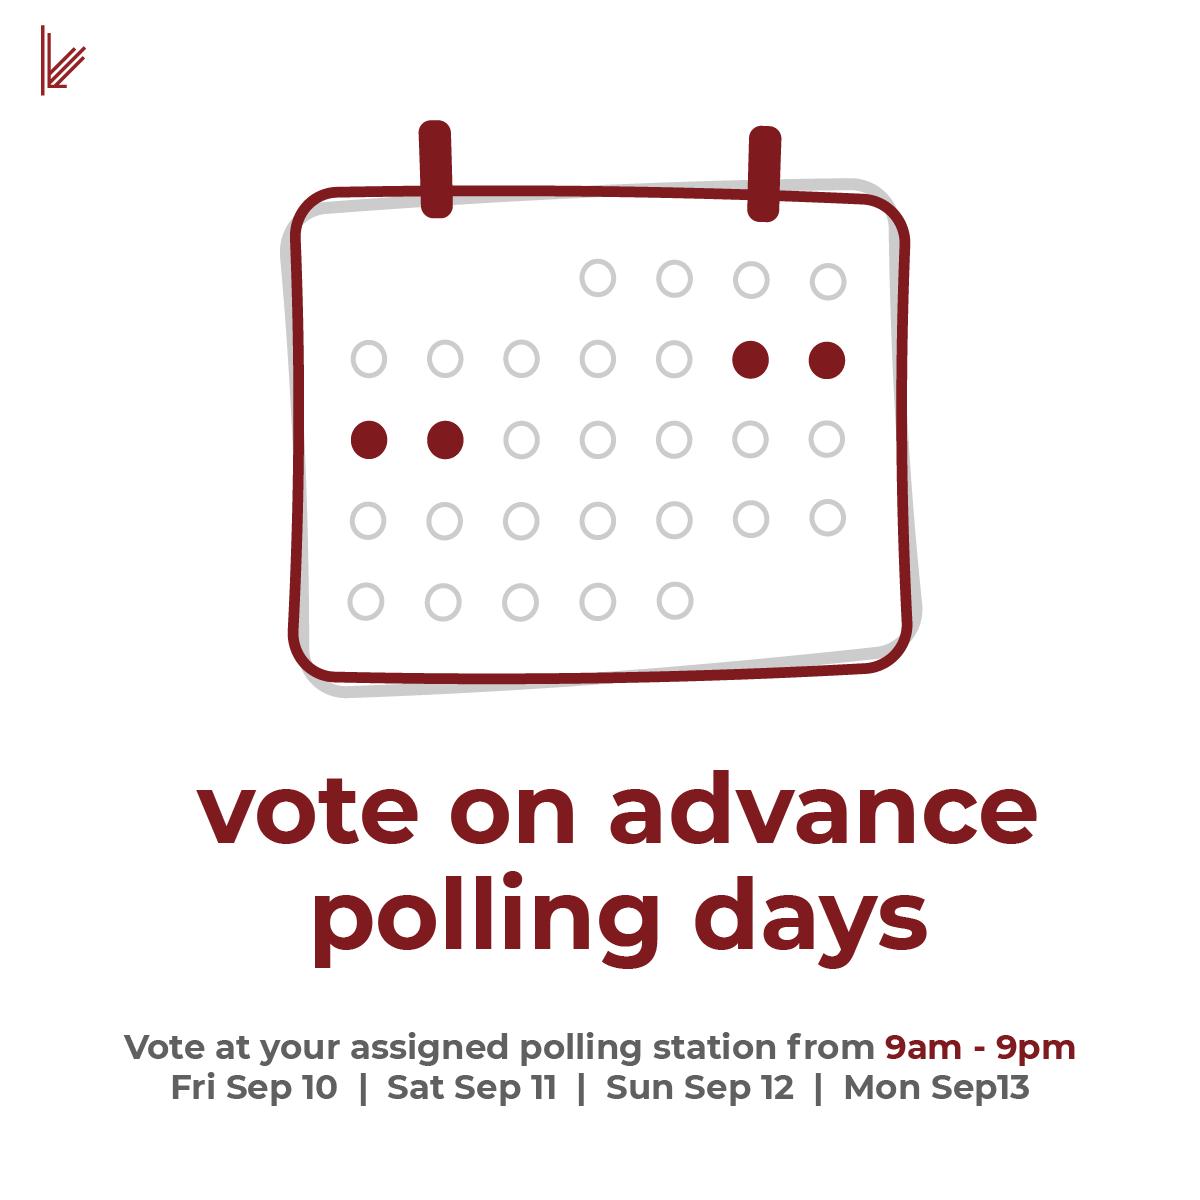 adv_poll.png